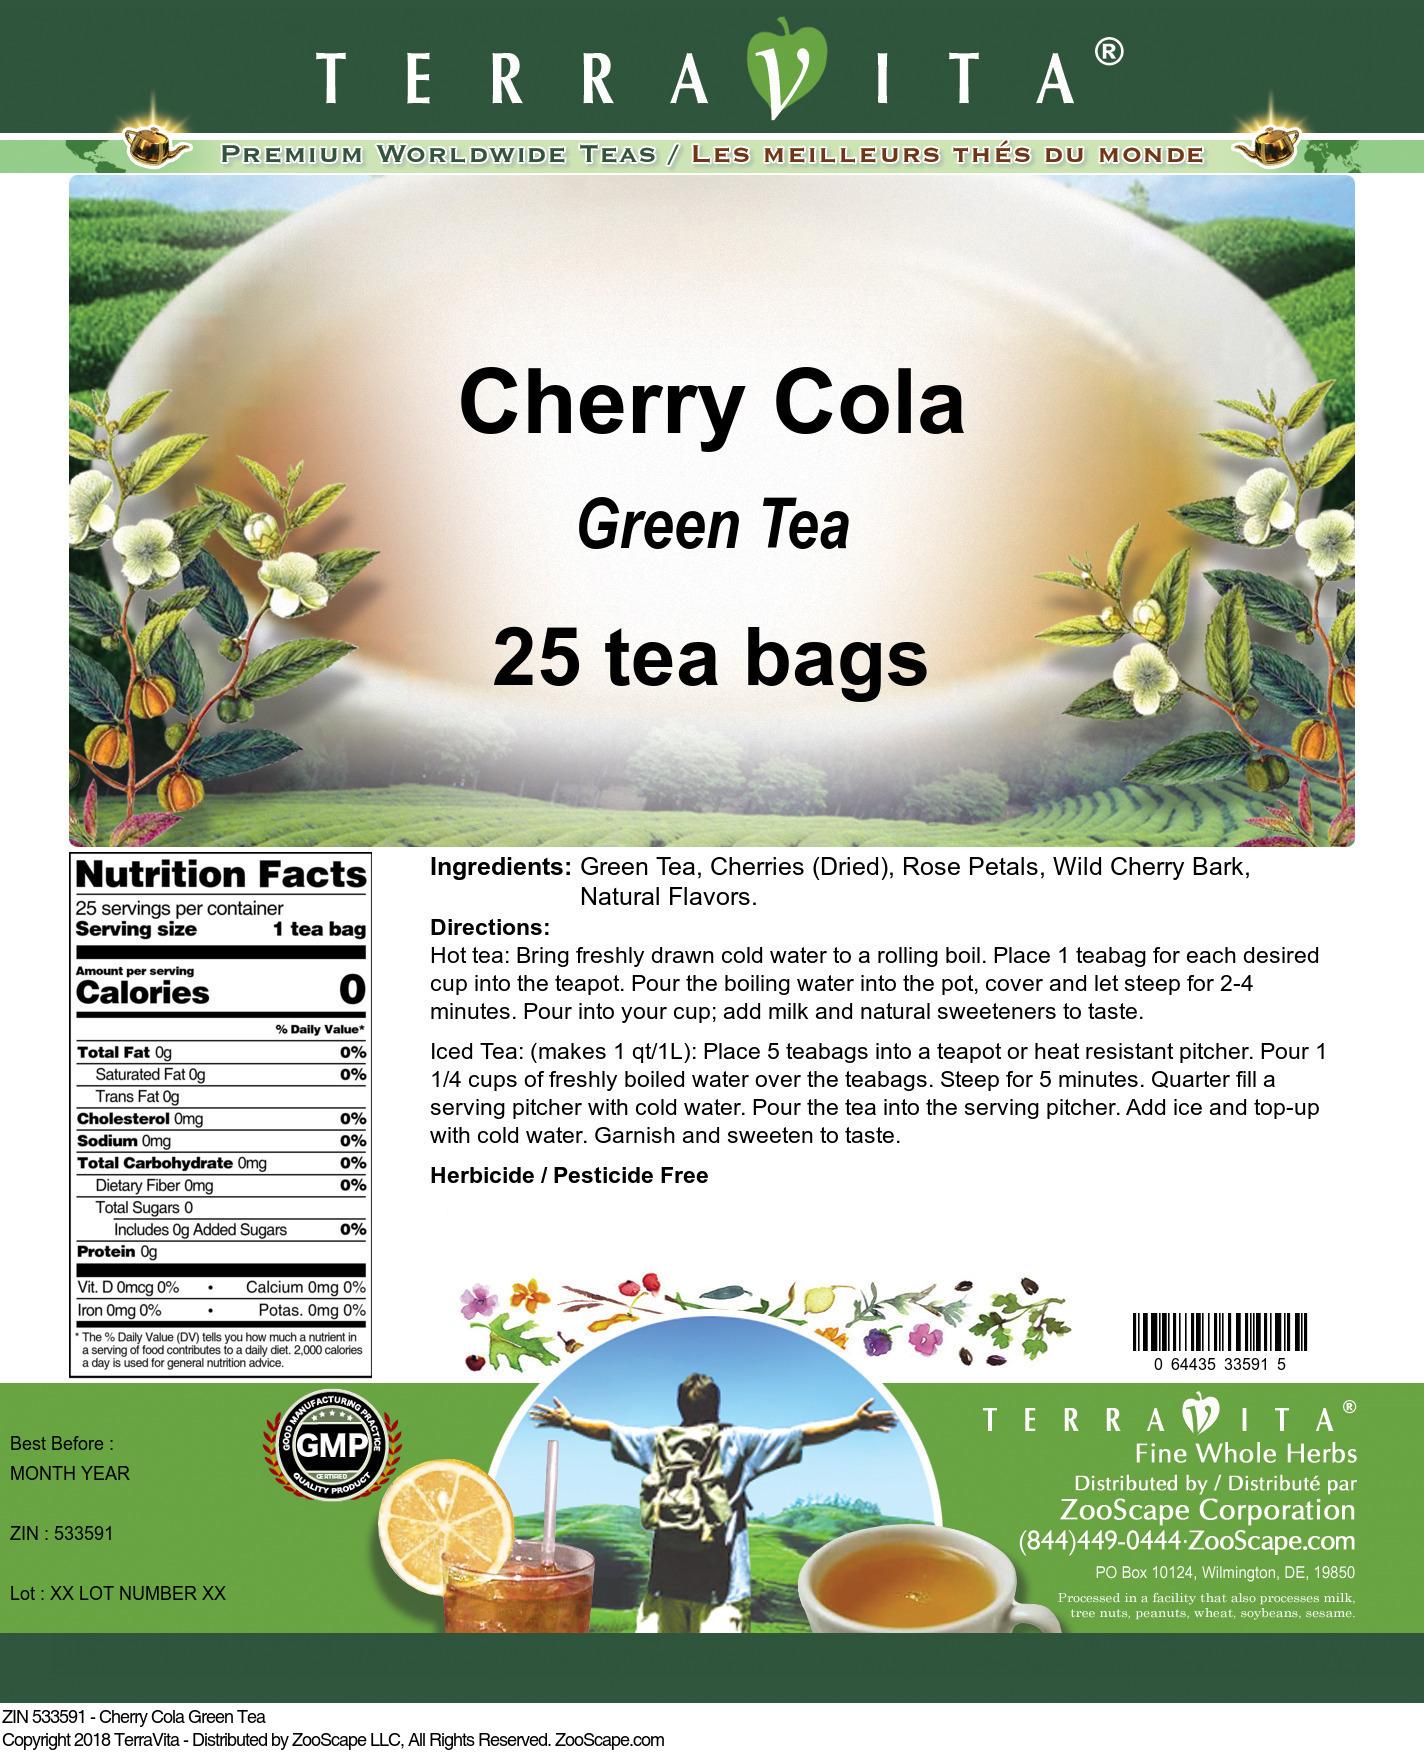 Cherry Cola Green Tea